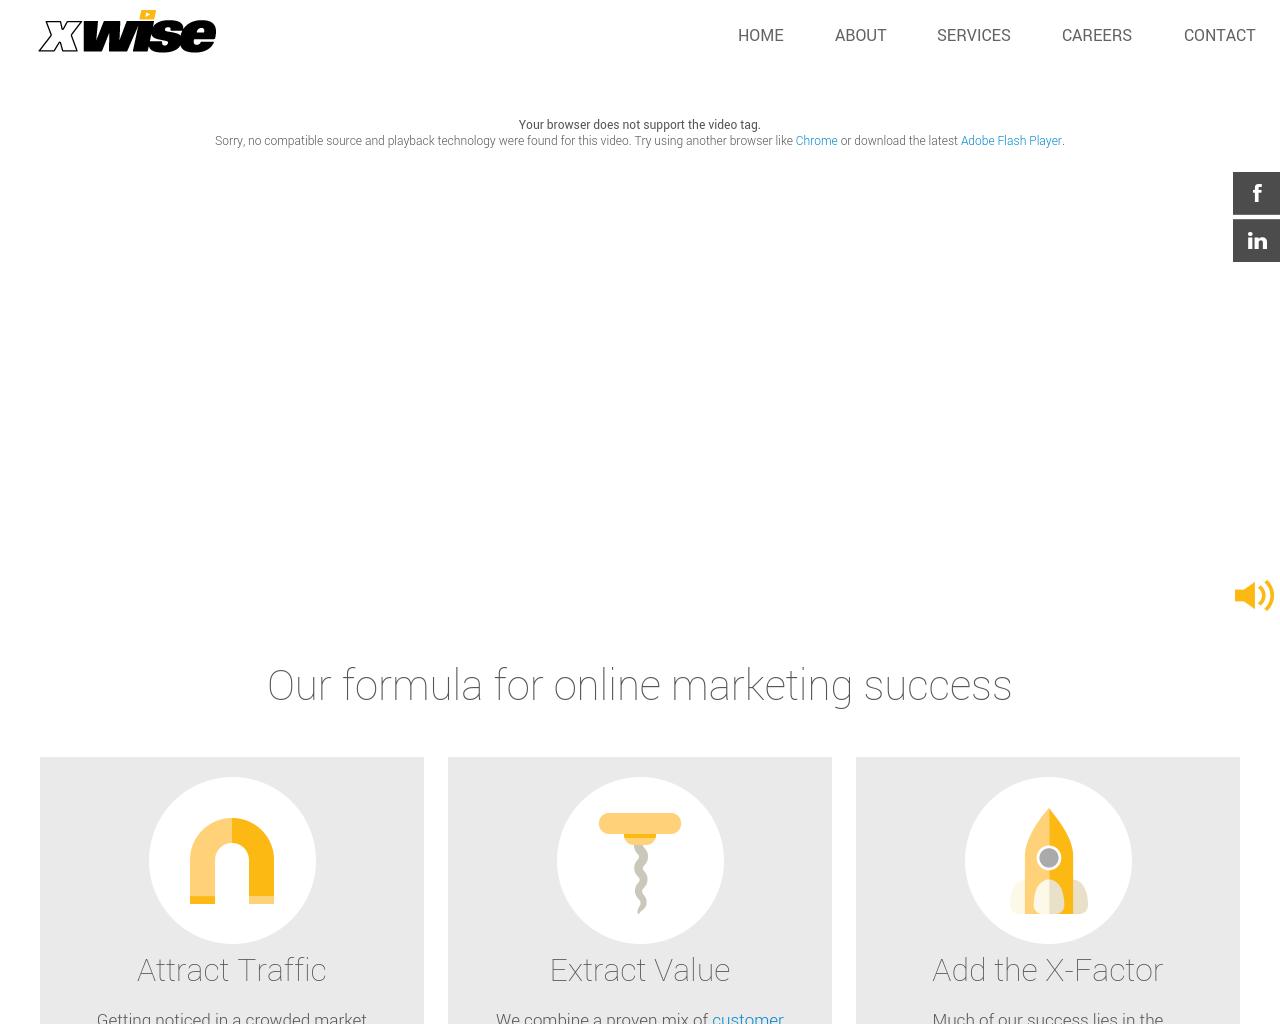 xwise-Advertising-Reviews-Pricing